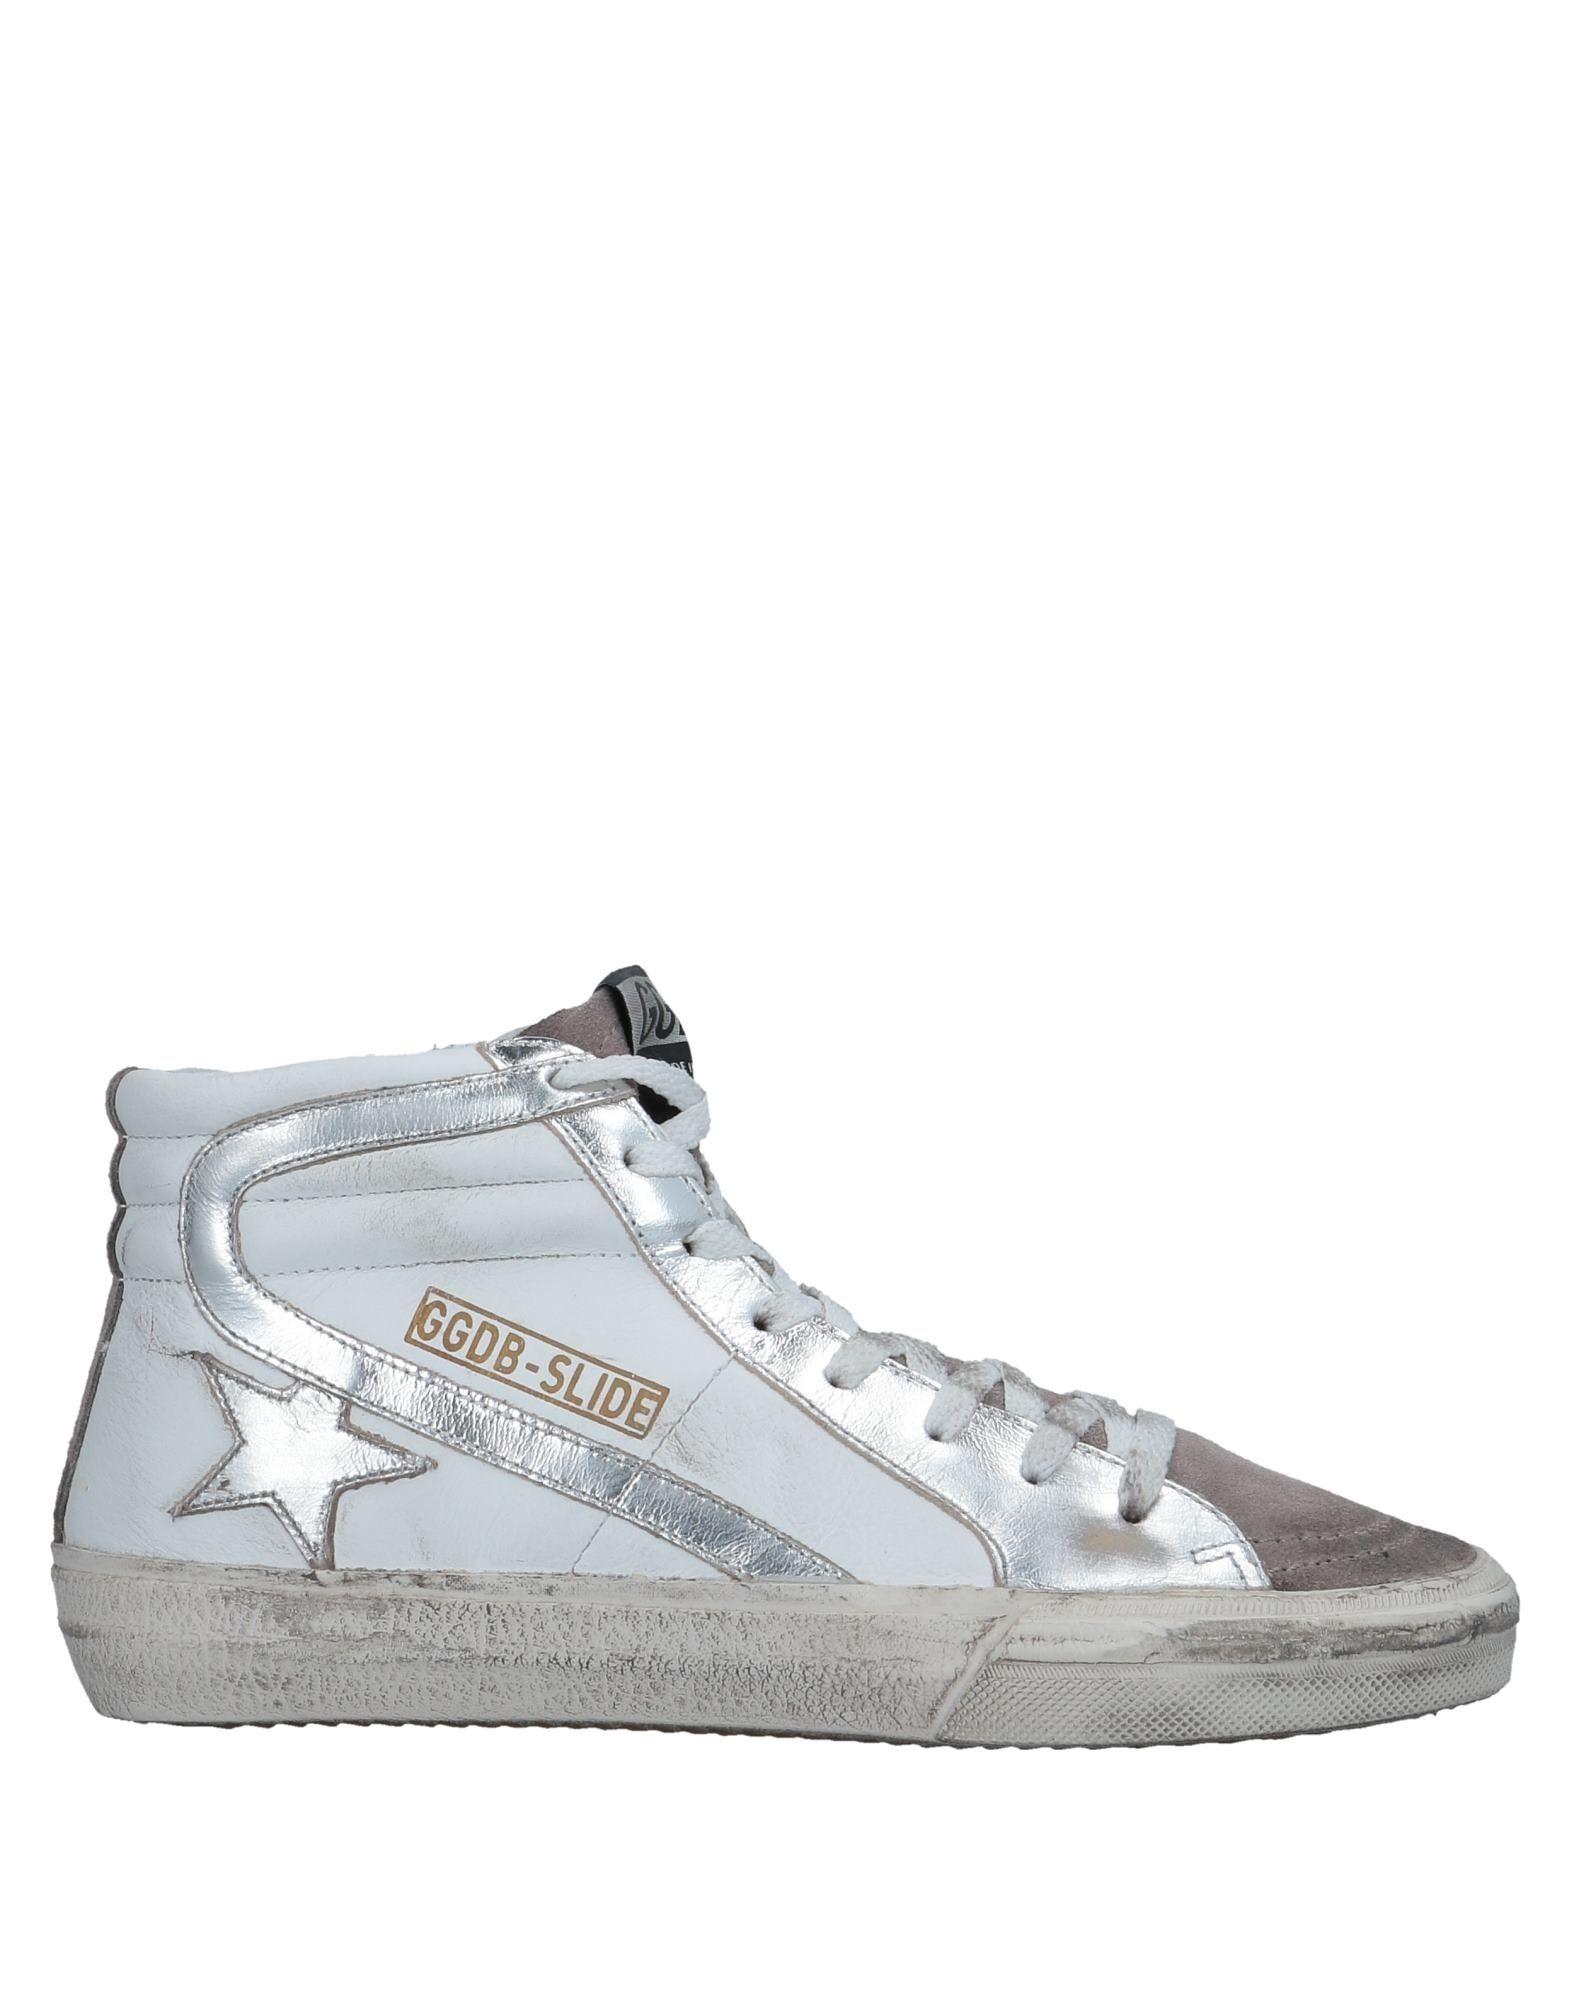 Sneakers Golden Goose 11506922KF Deluxe Brand Donna - 11506922KF Goose bf9504